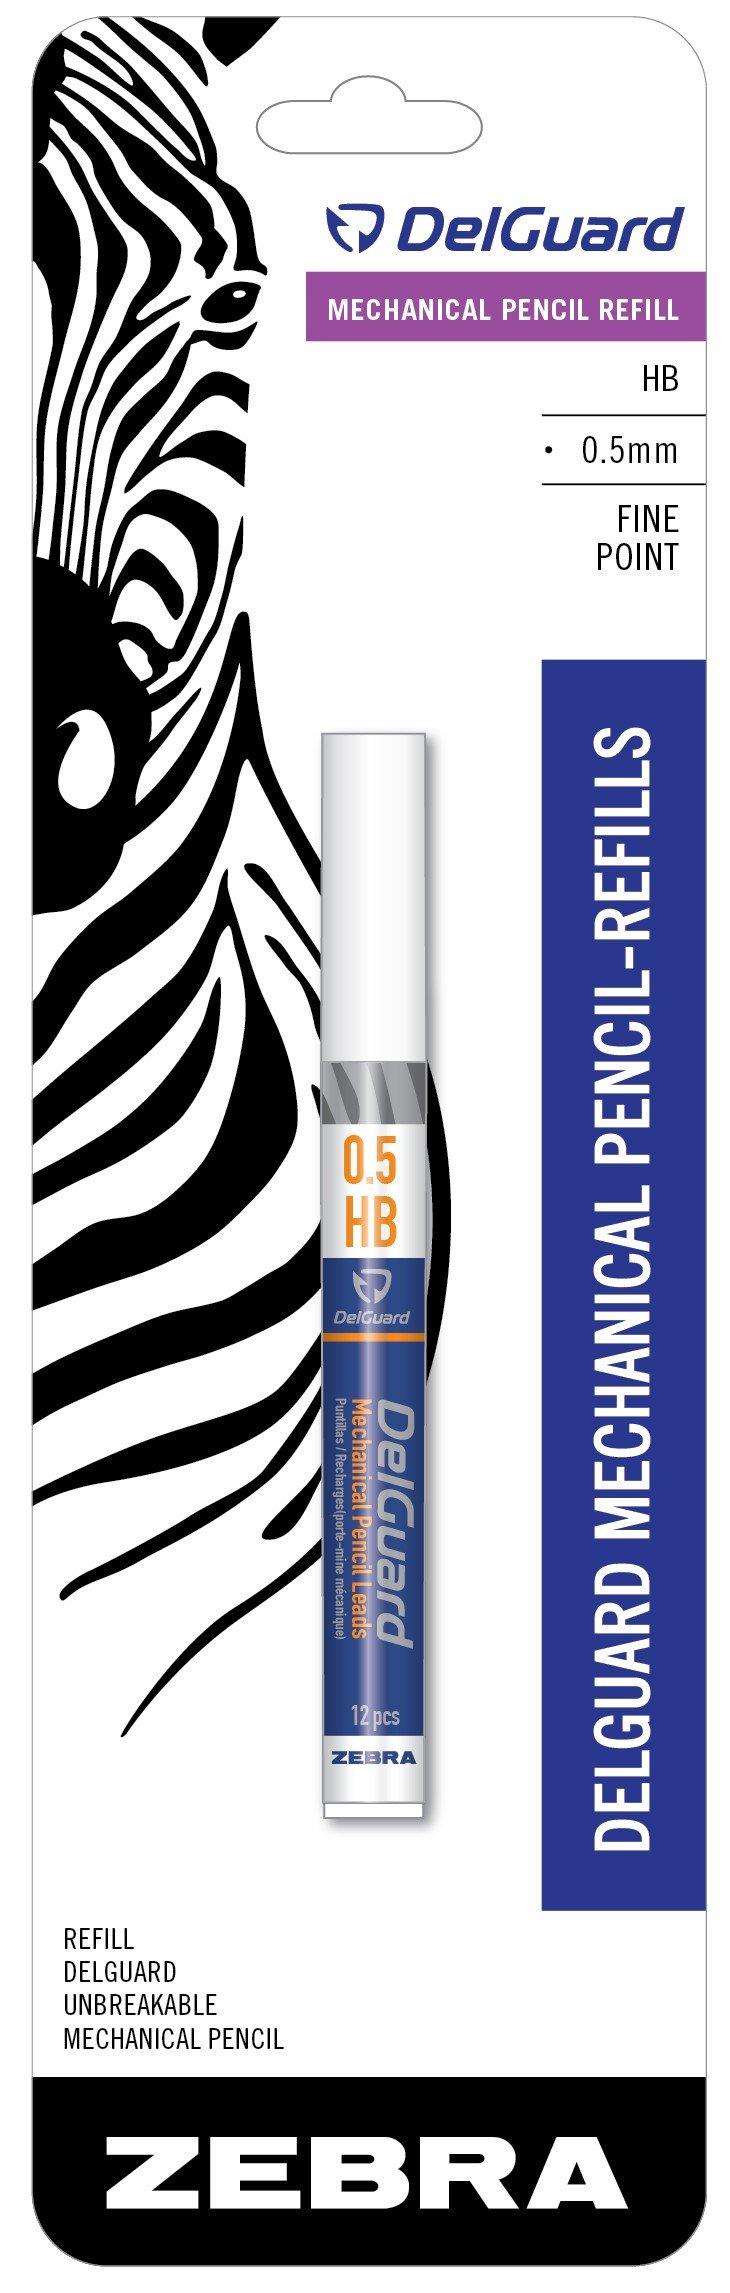 Zebra Delguard Lapiz Mecanico Hb#2 Lead Refills 5-count